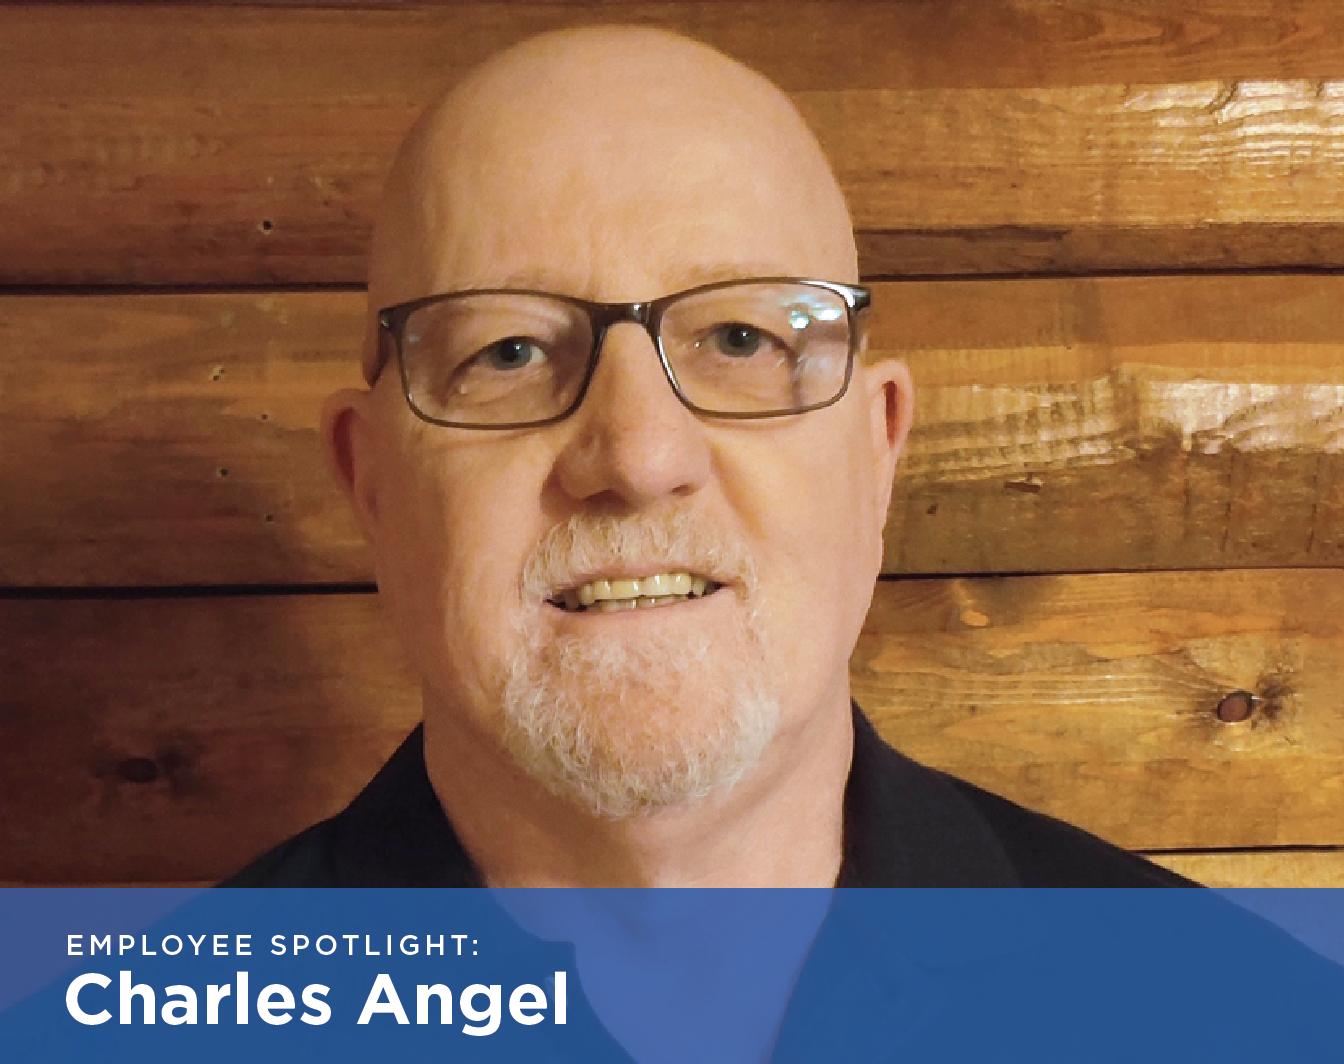 Charles Angel